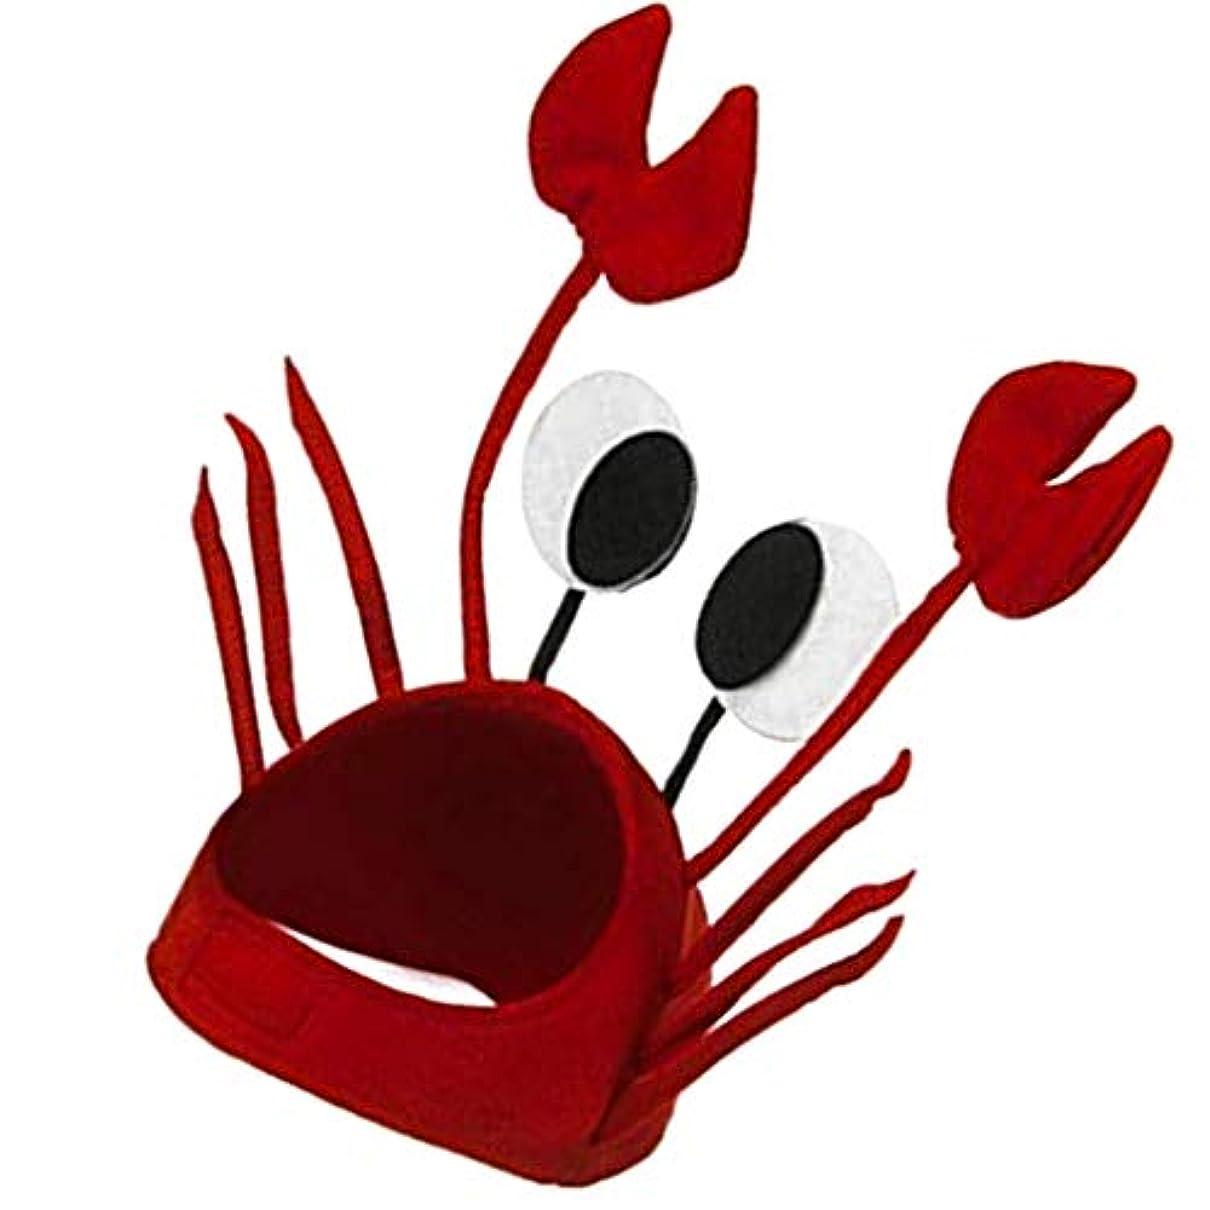 uzinby 女の子 カニハット 幼稚園ボーイズ 子供の日 ビーニーキャップ おかしい 休日の小道具 クリスマスのギフト